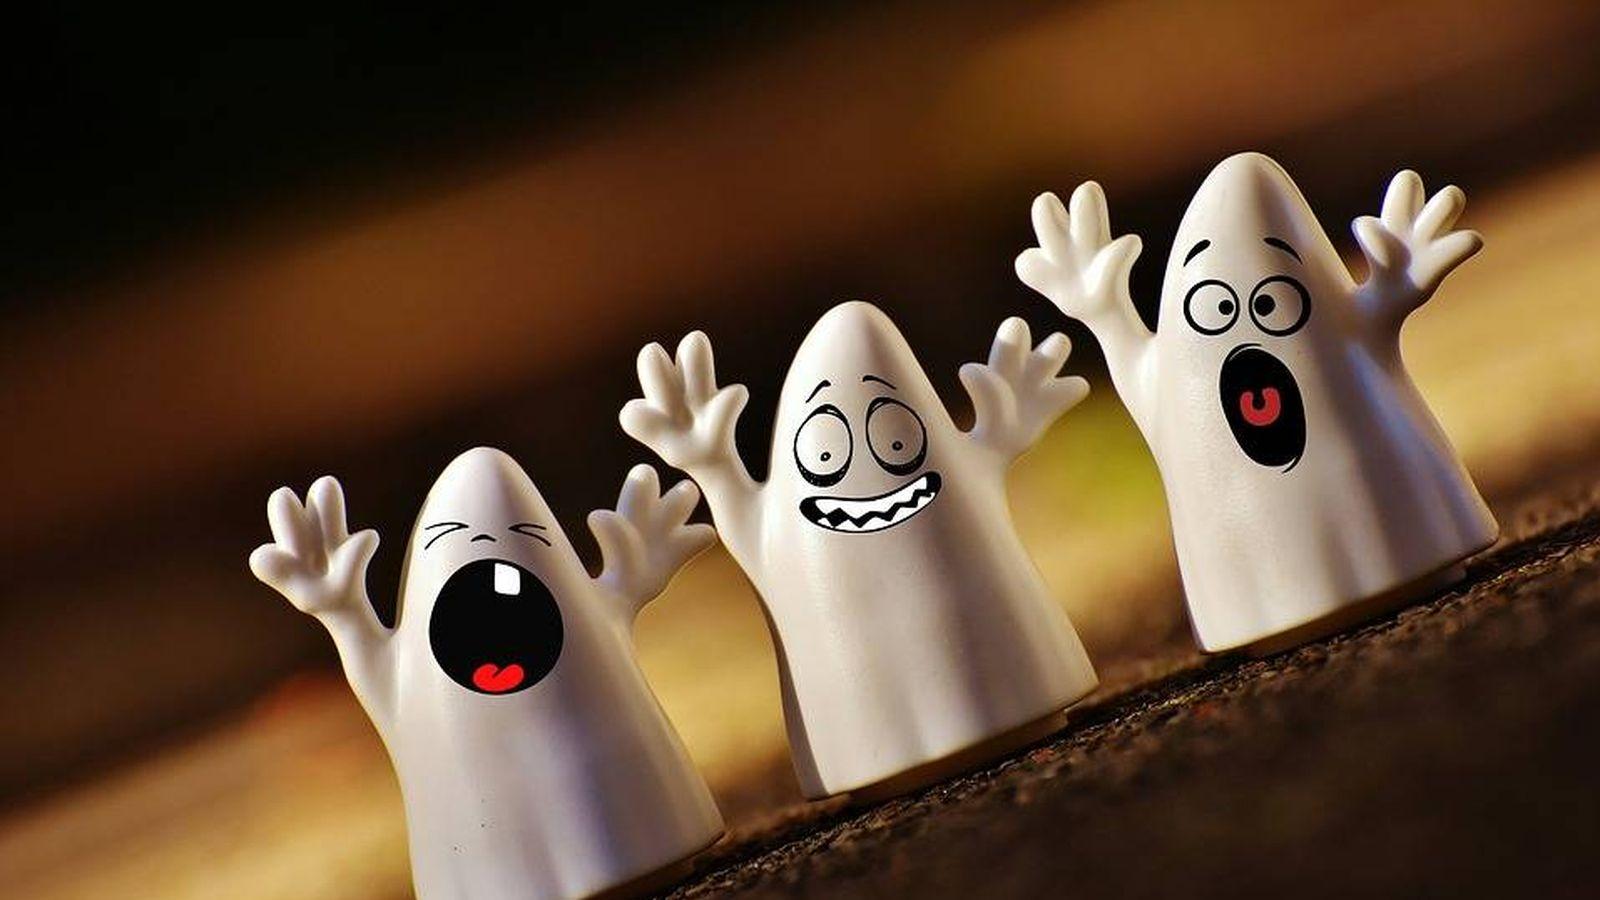 Foto: Ghosting. Foto: Pixabay